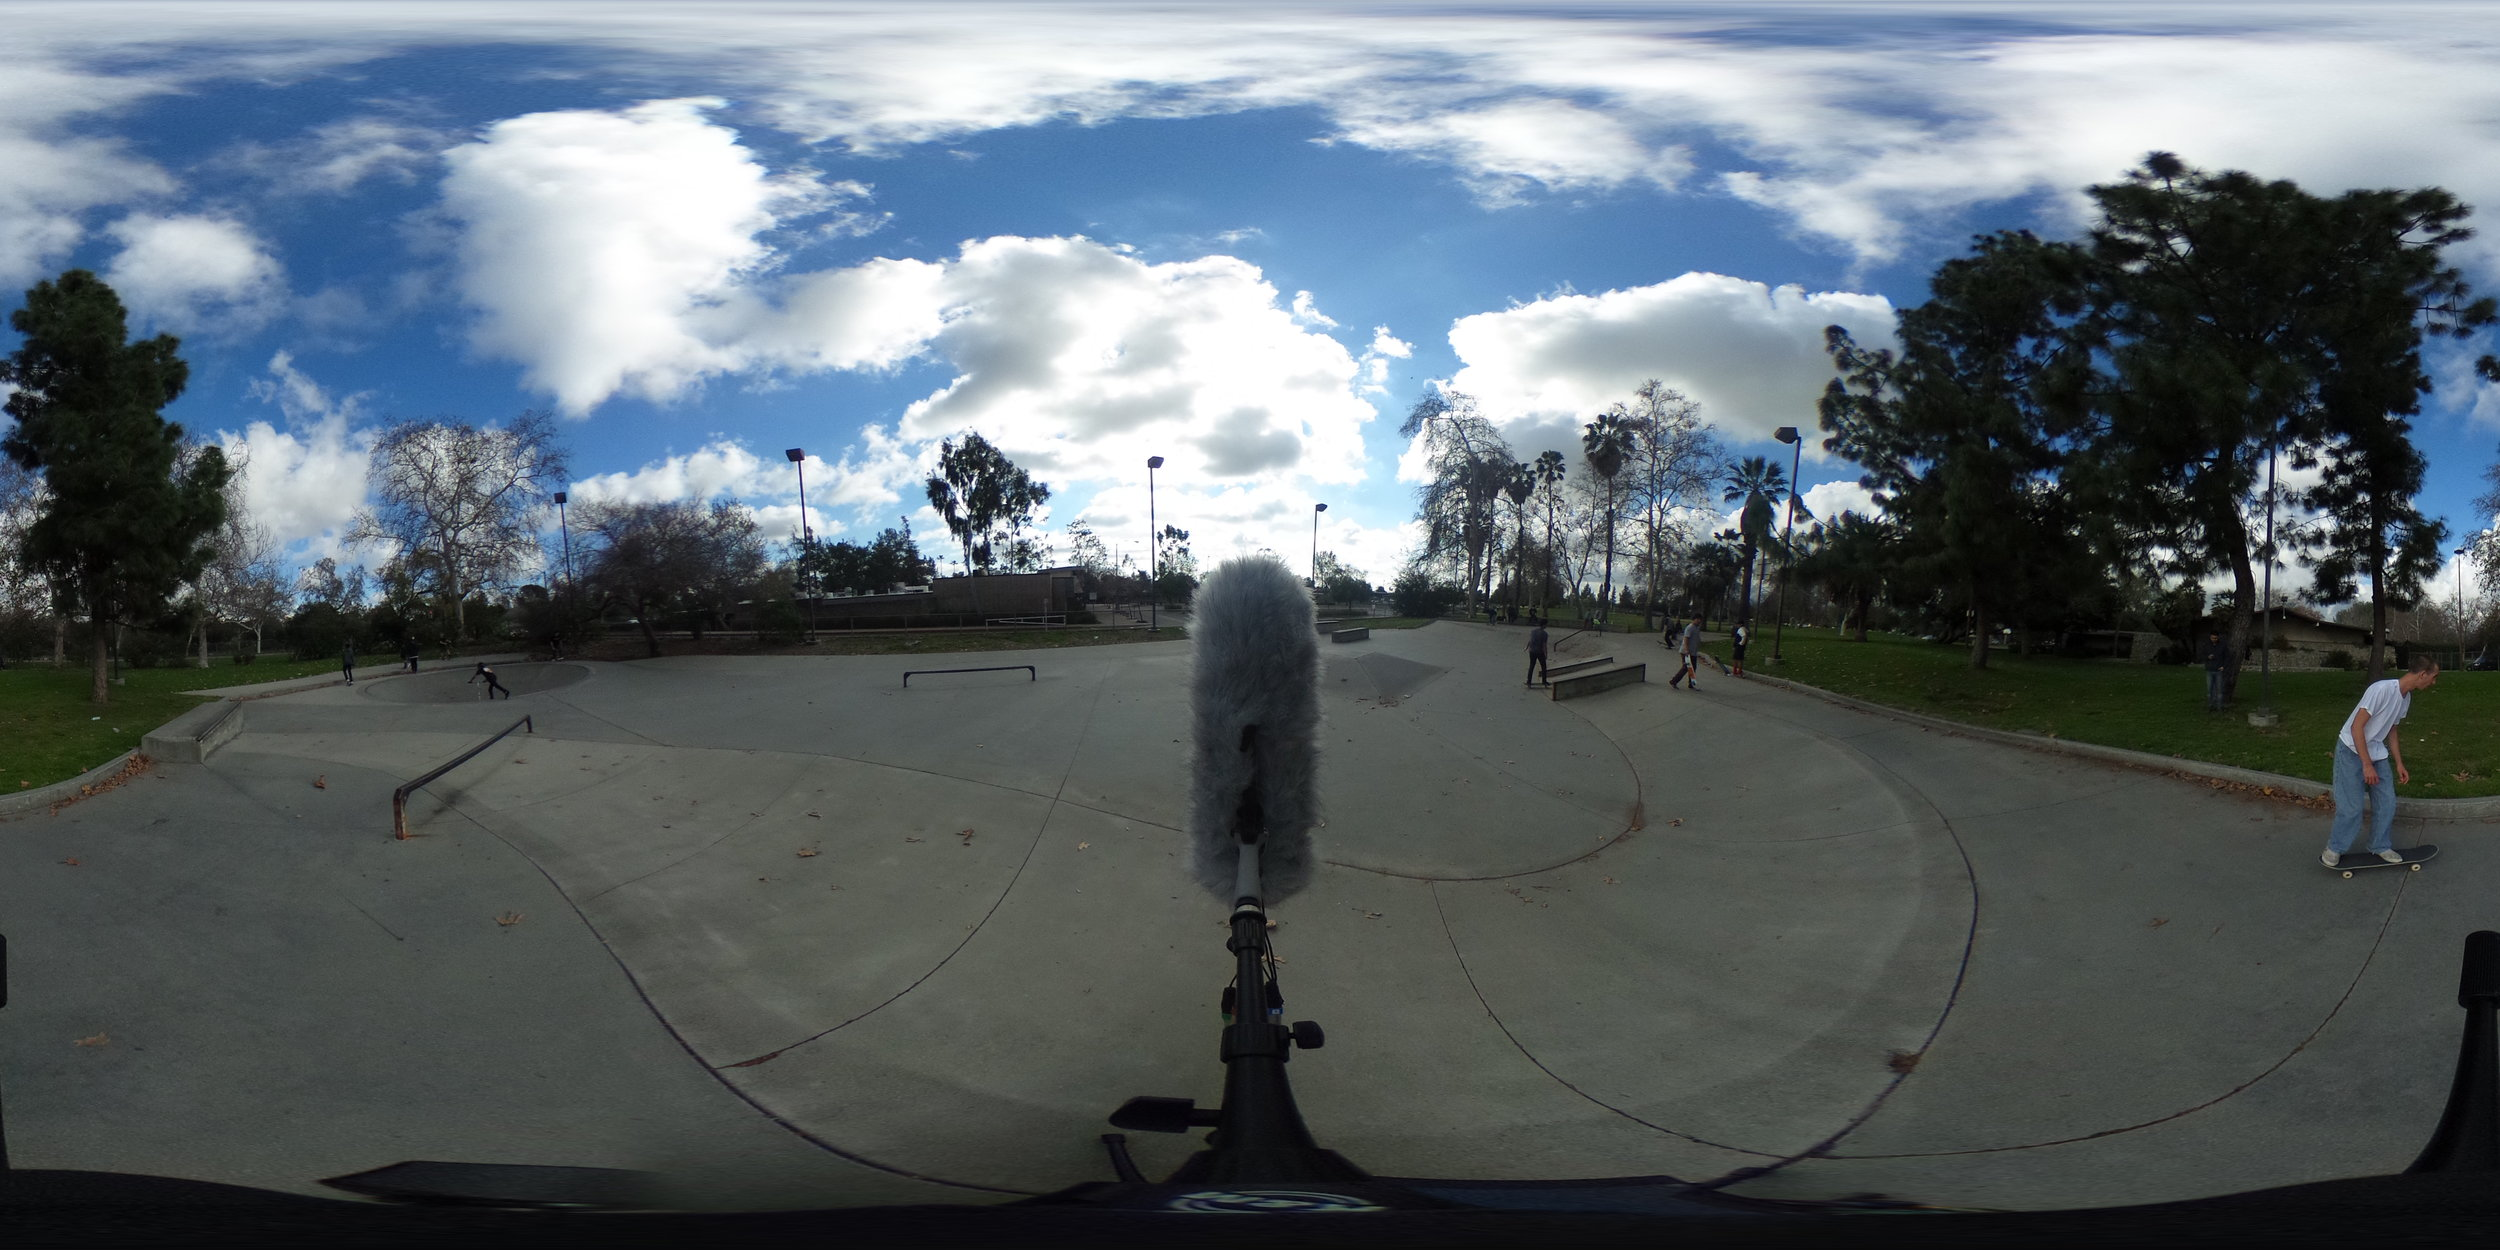 EXT_Day_Skatepark_SmallGroupsTalking_SkateboardBys_360PictureReference.JPG